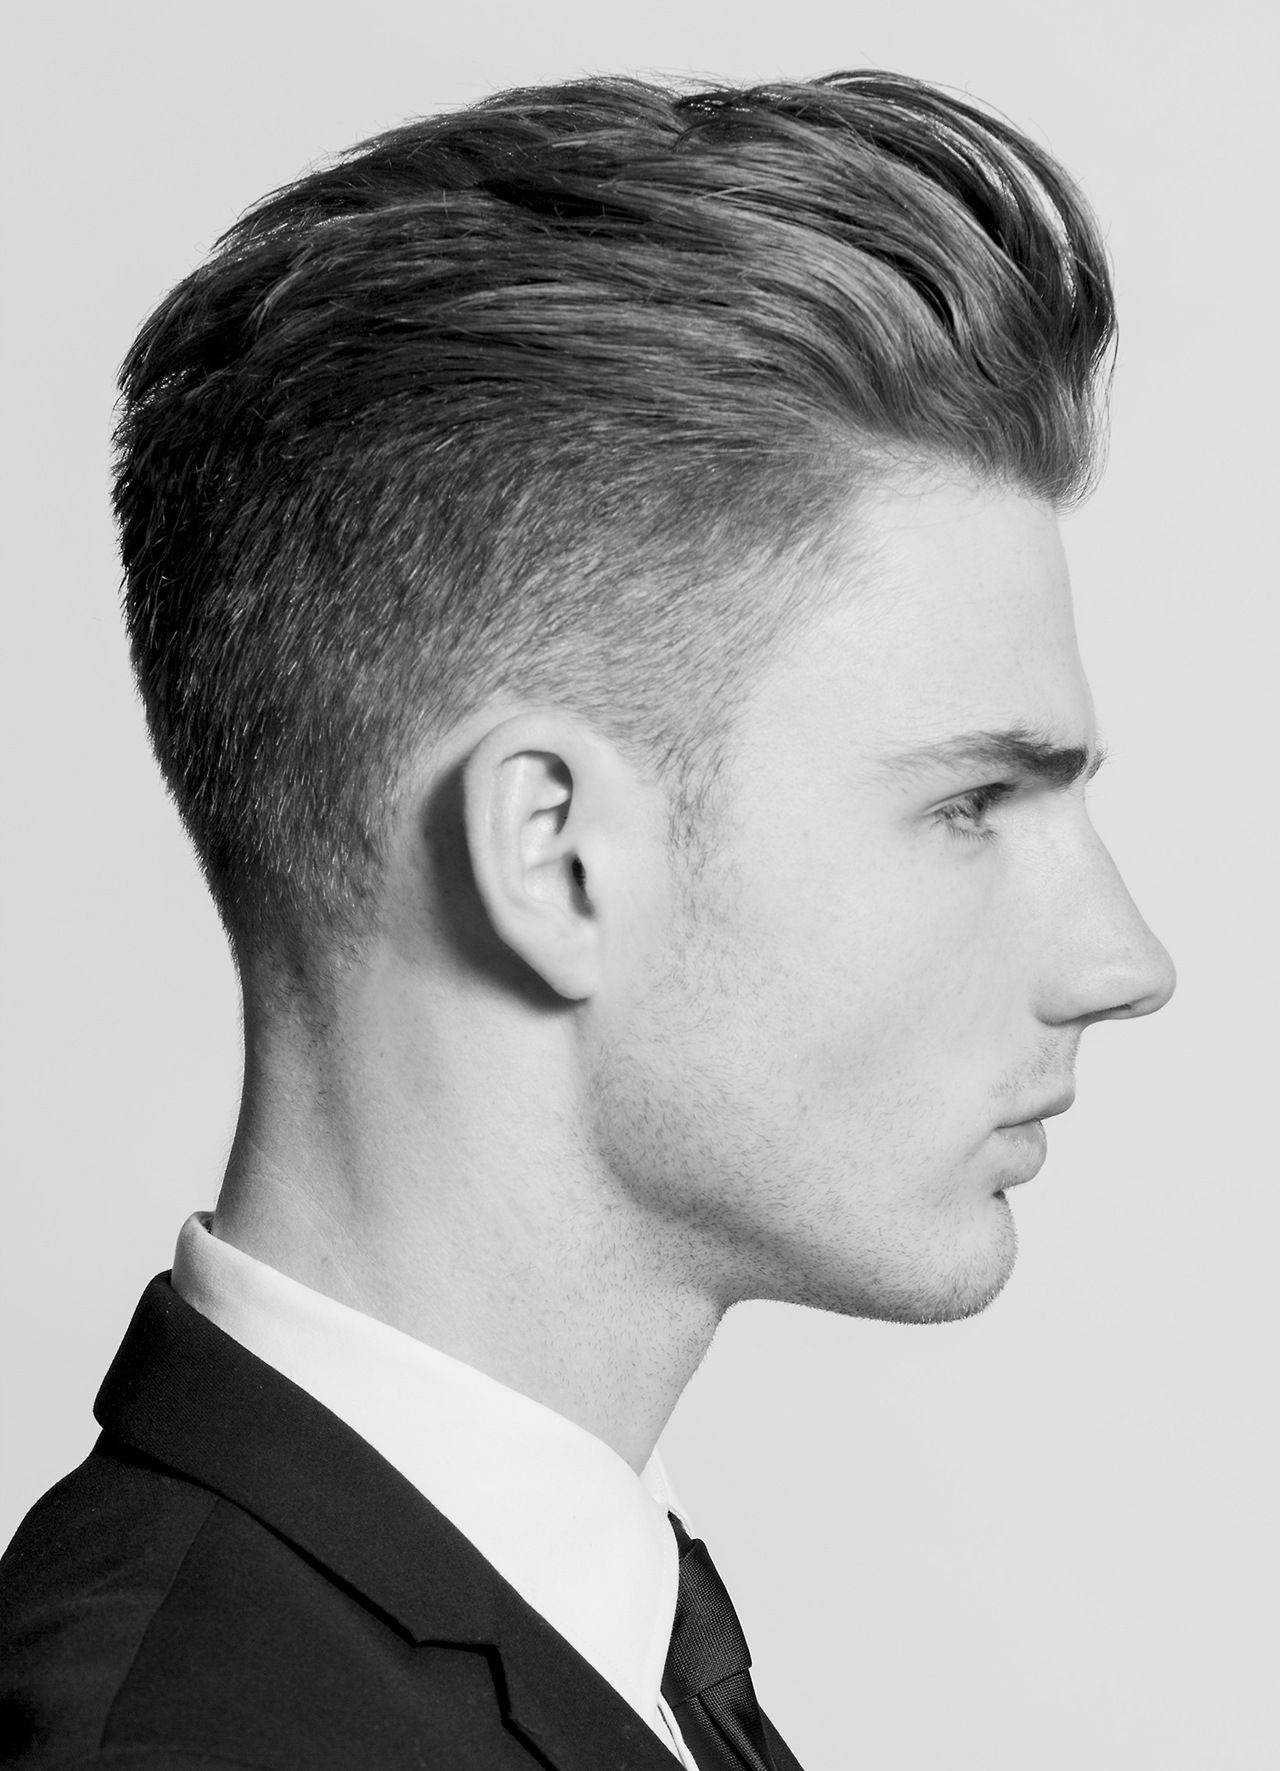 mens hair | jakes haircut | trendy mens haircuts, hair cuts